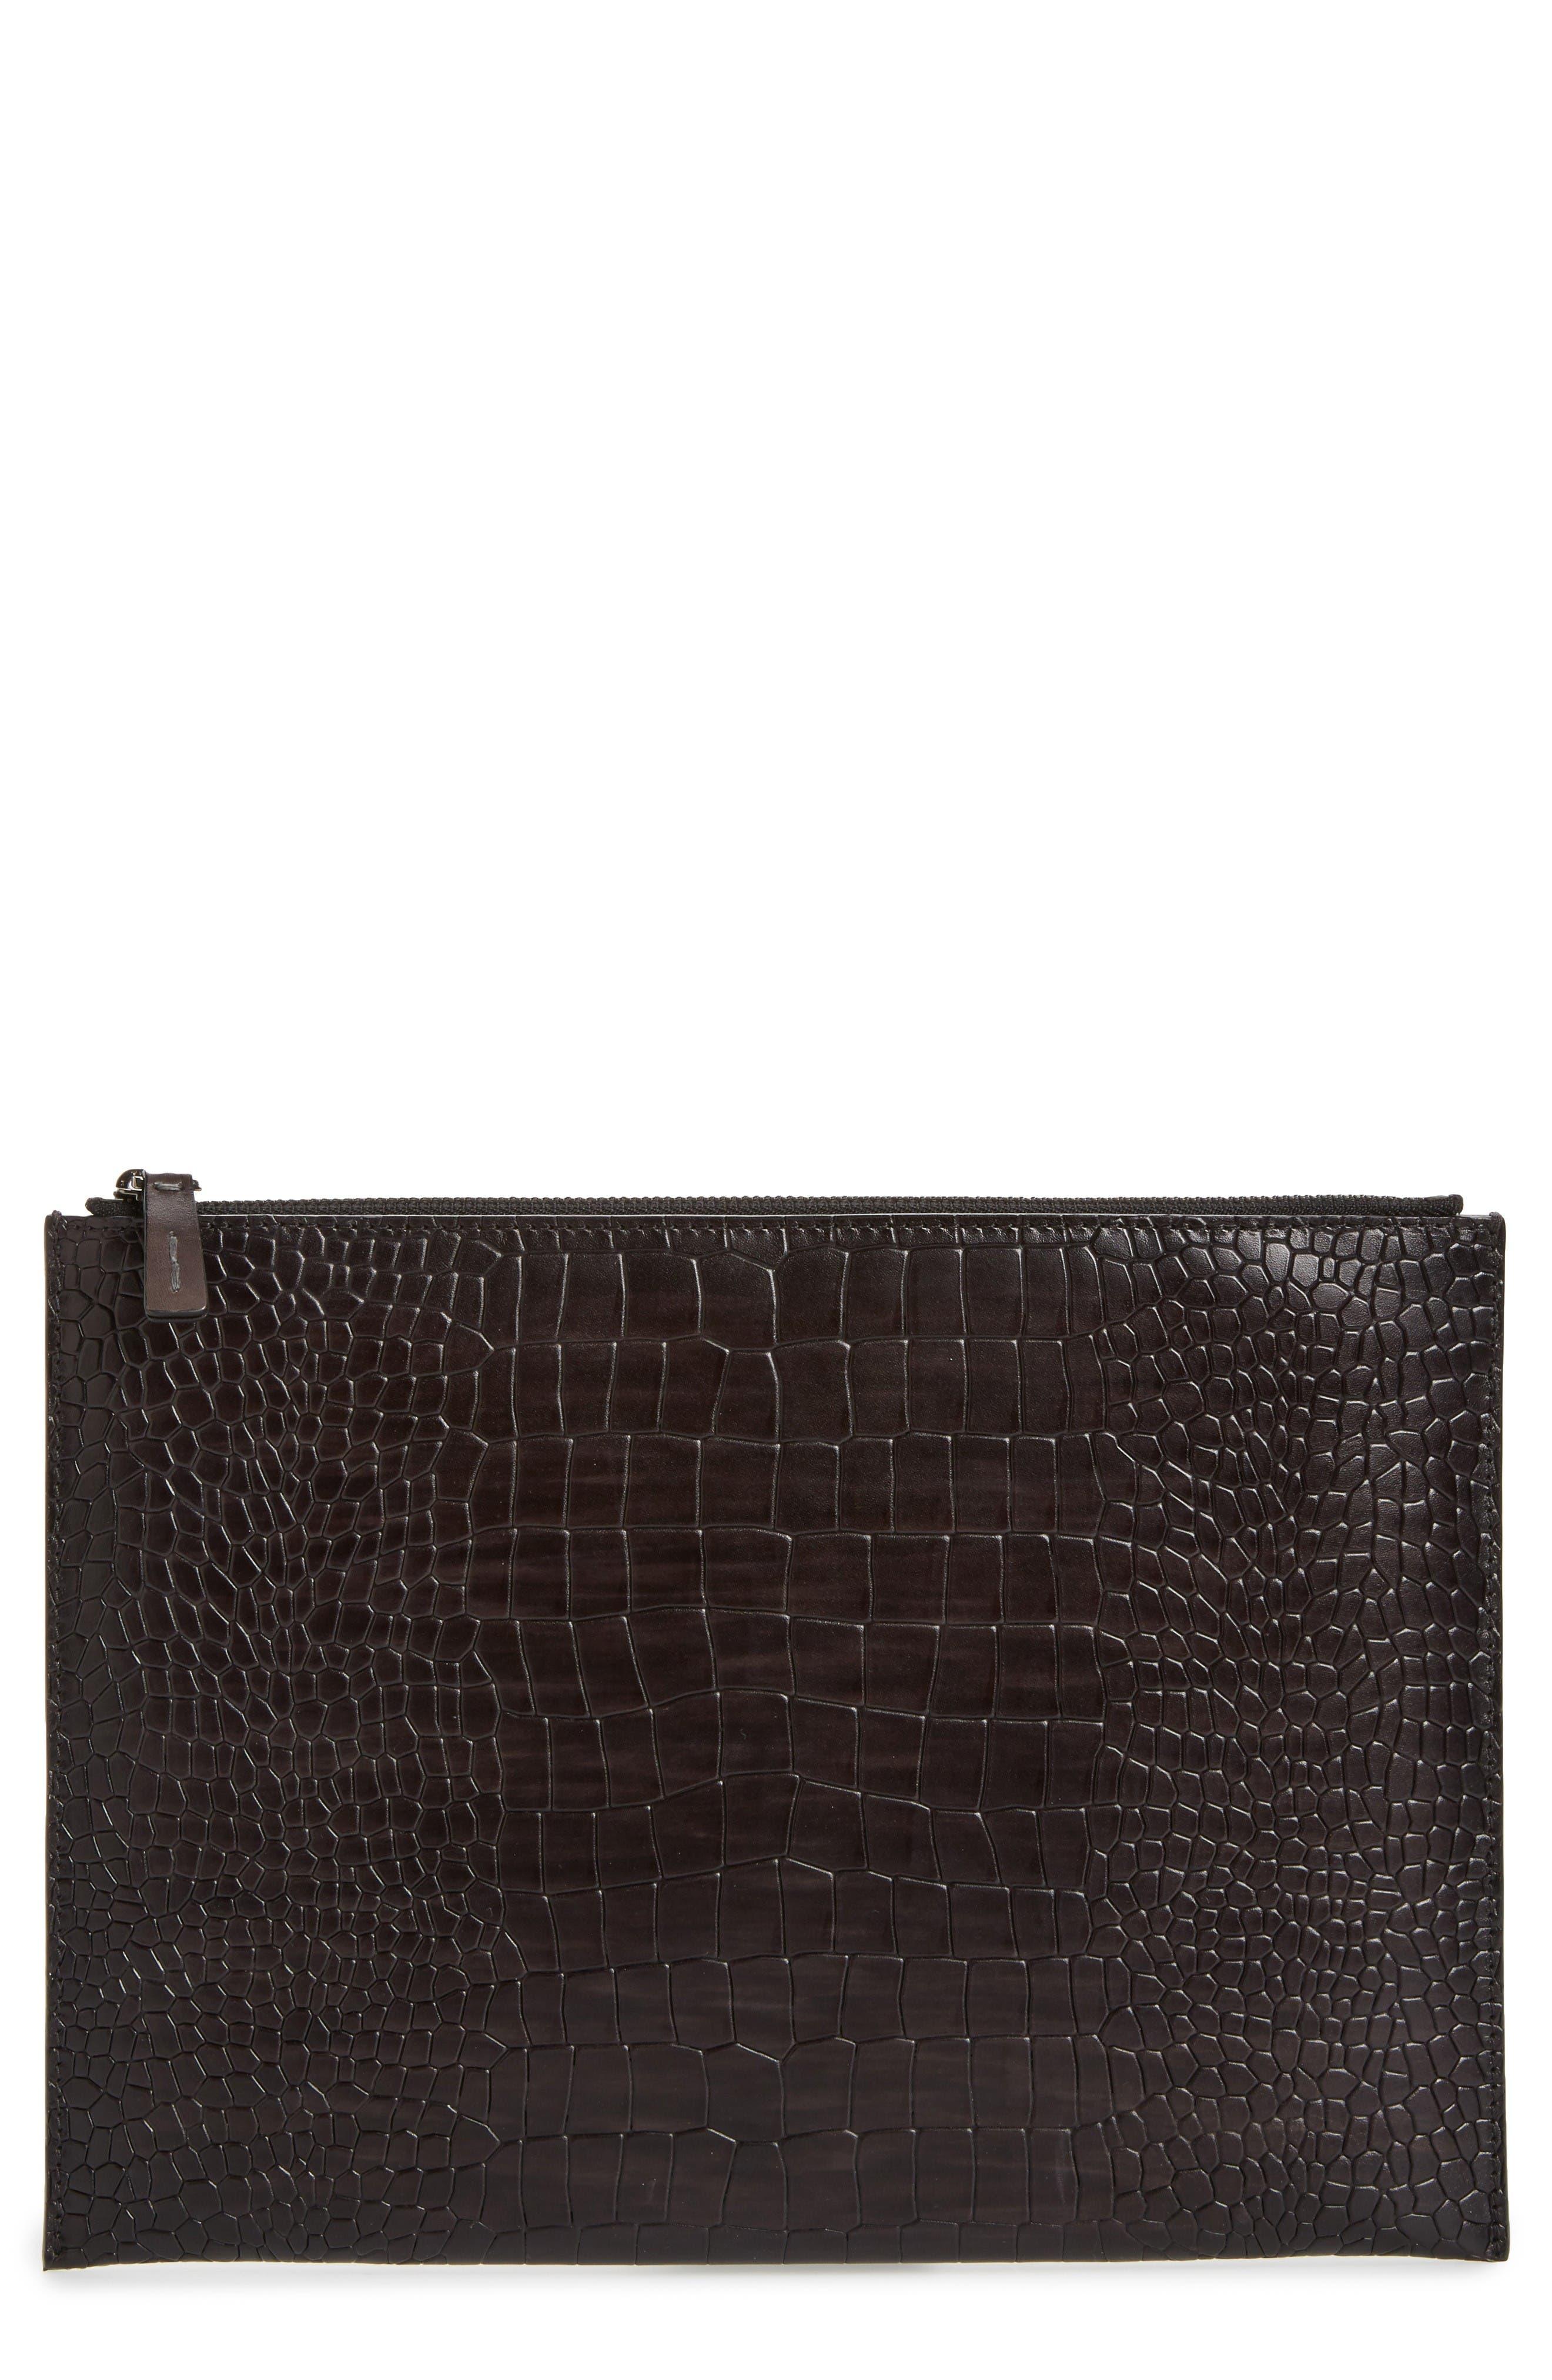 Alternate Image 1 Selected - Magnanni Leather Tablet Case